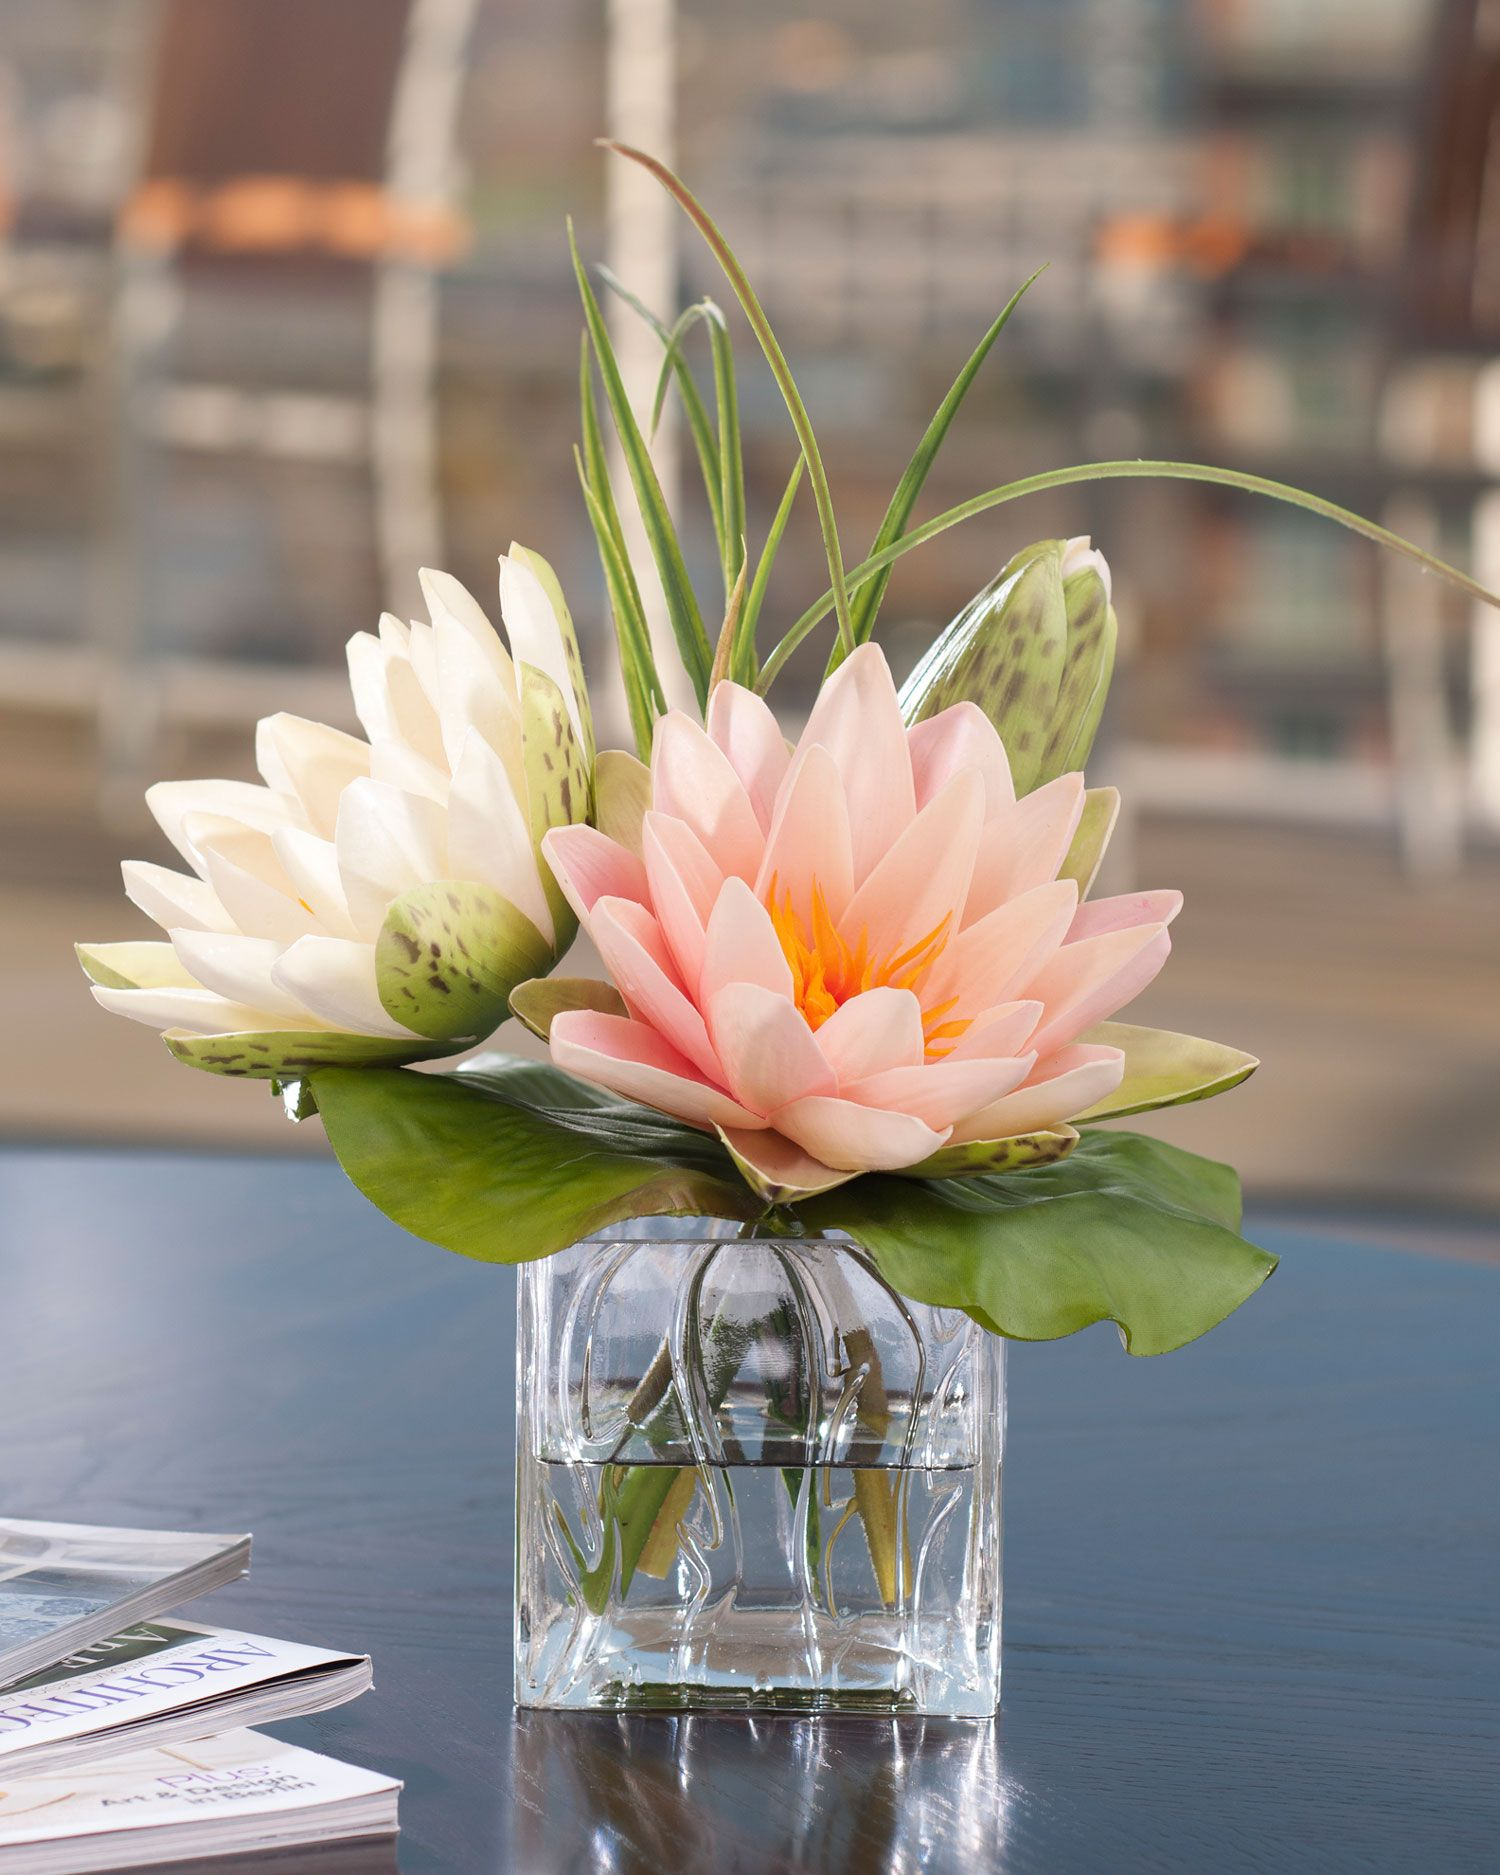 Lotus Blossom Lily Padsilk Flower Arrangement Wedding